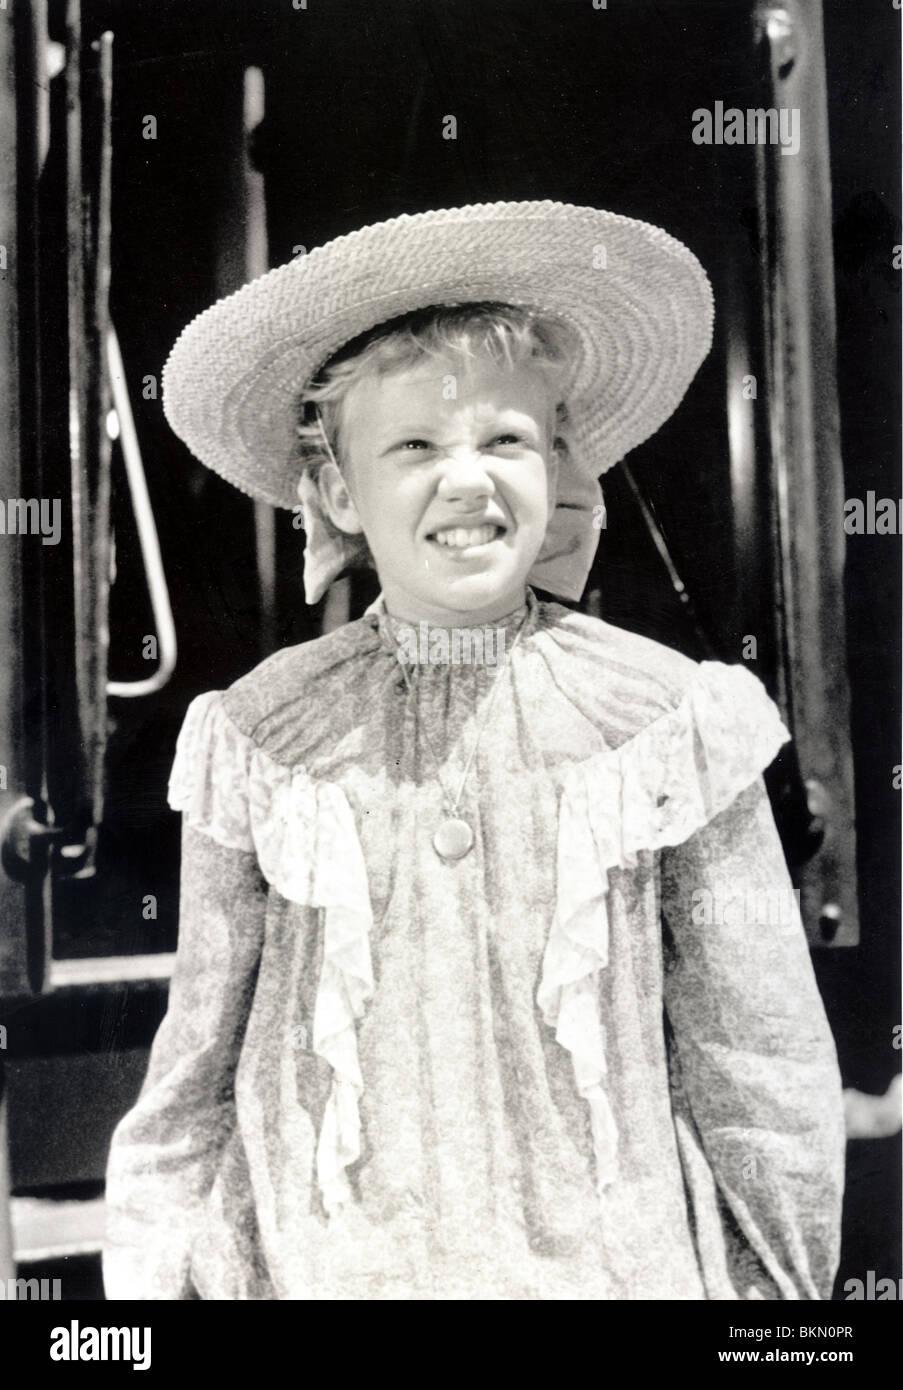 POLLYANNA -1960 HAYLEY MILLS - Stock Image